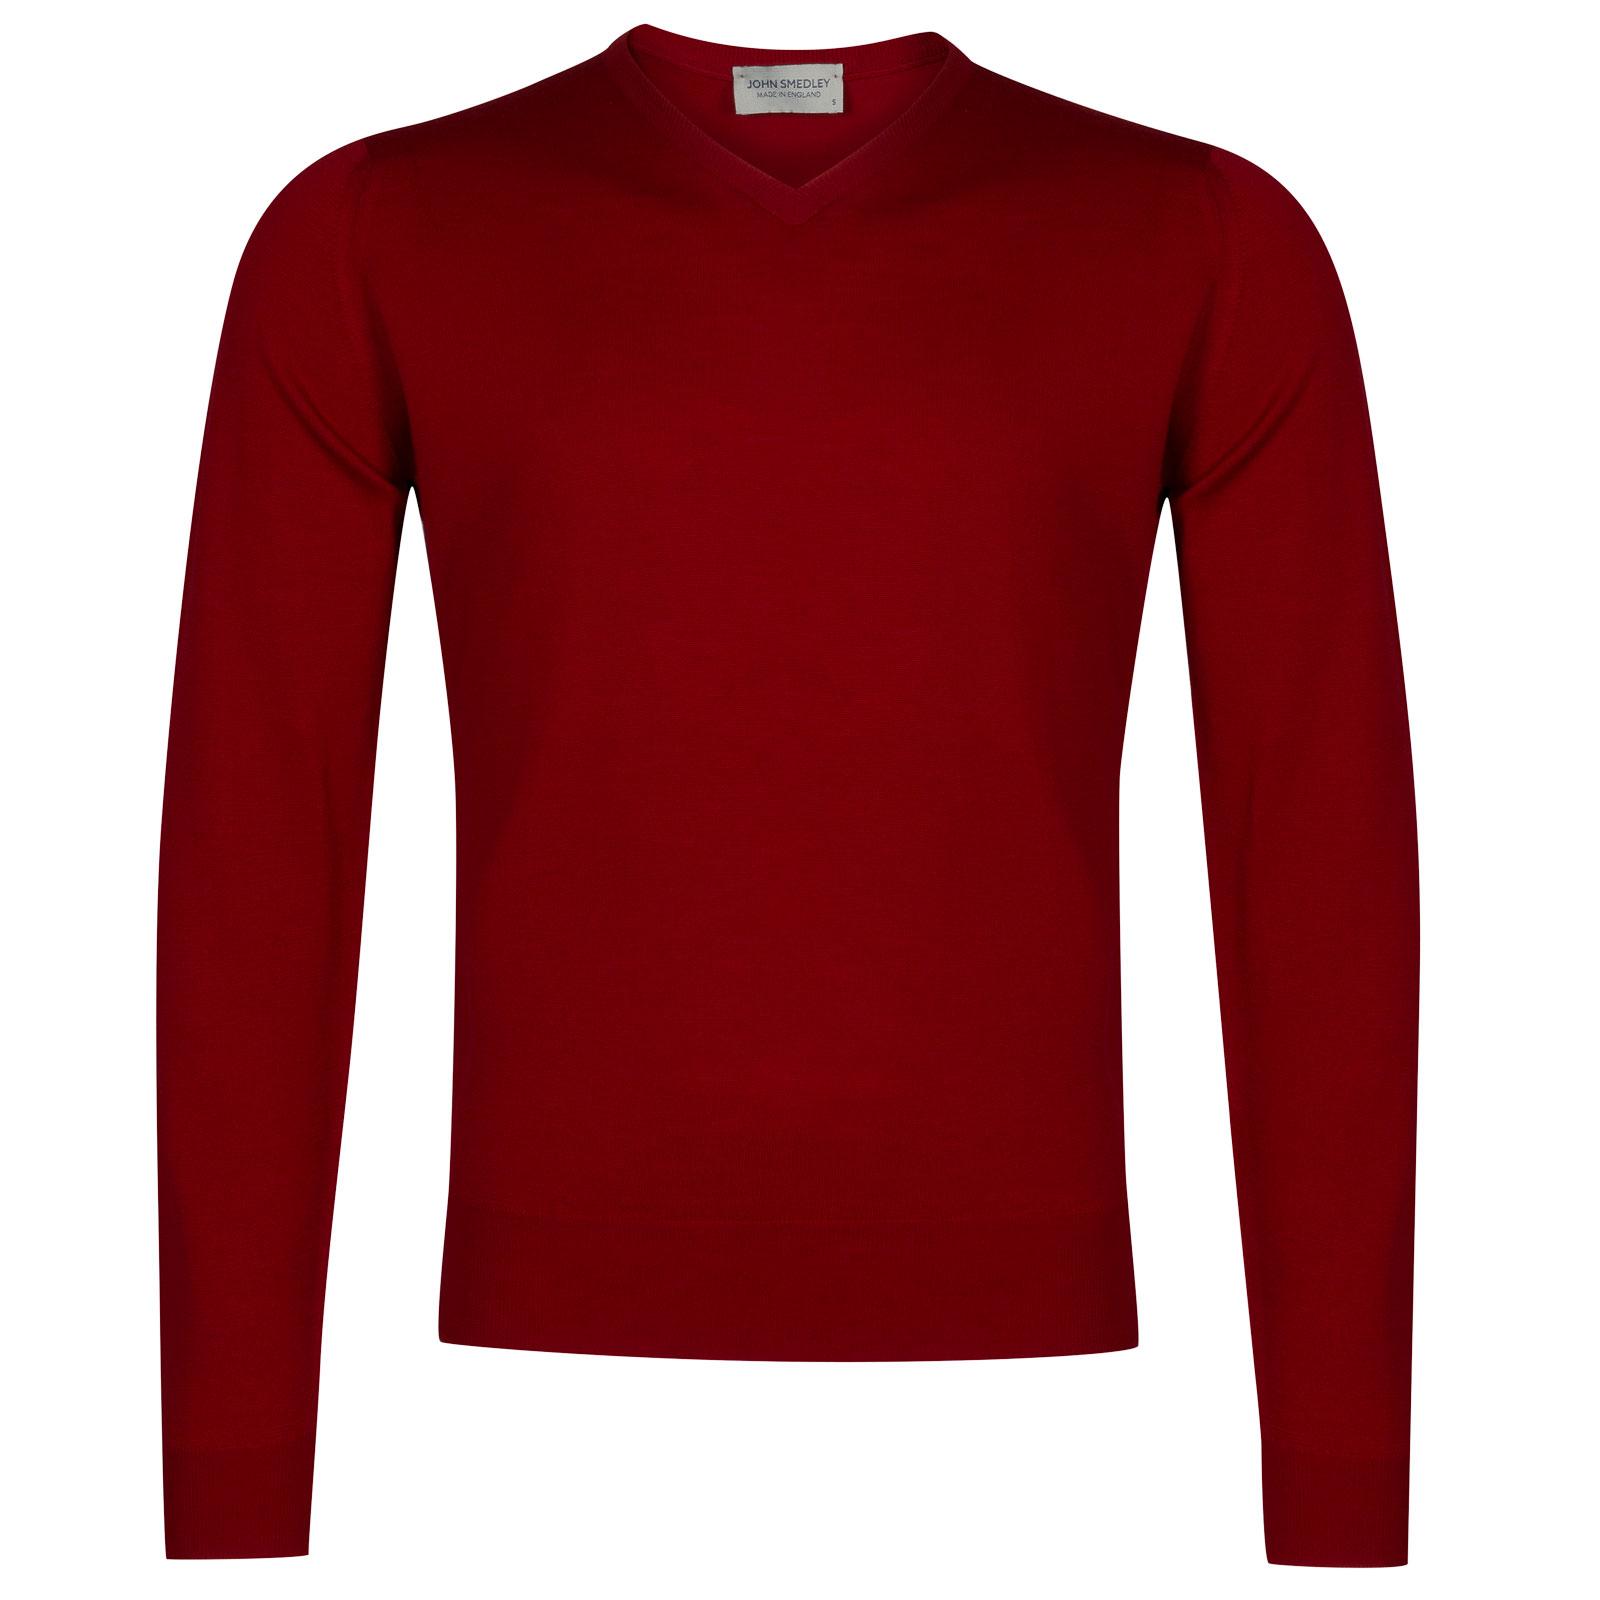 John Smedley genoa Merino Wool Pullover in Crimson Forest-M